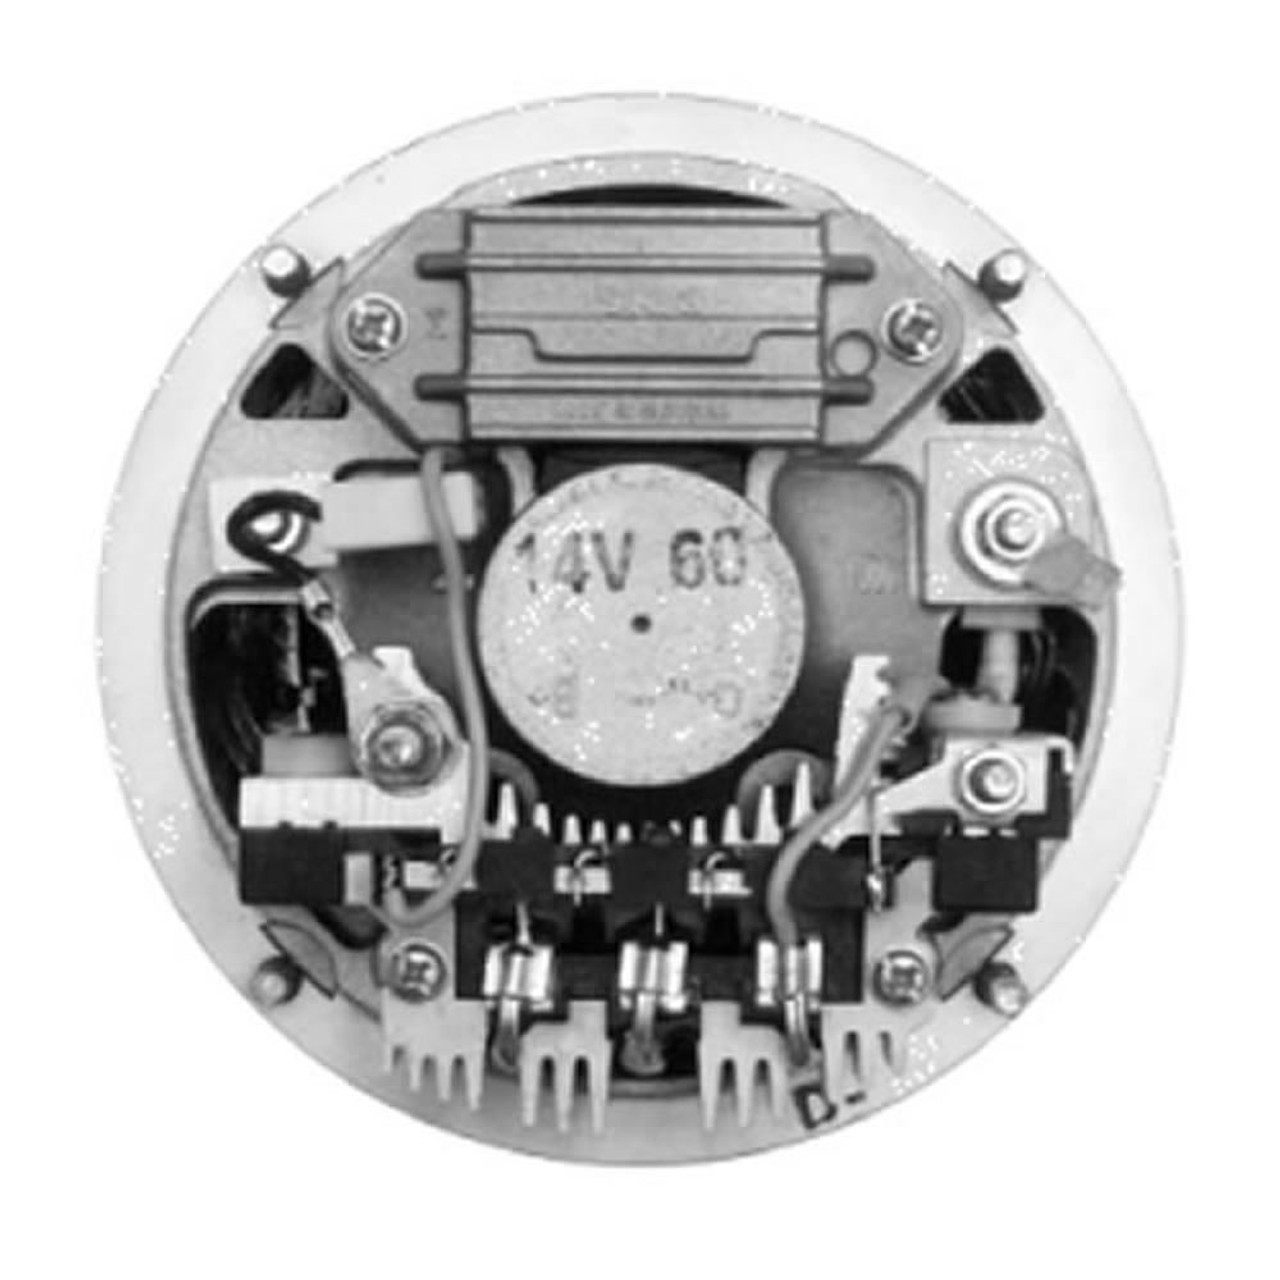 Iskra Alternator Wiring Diagram - on